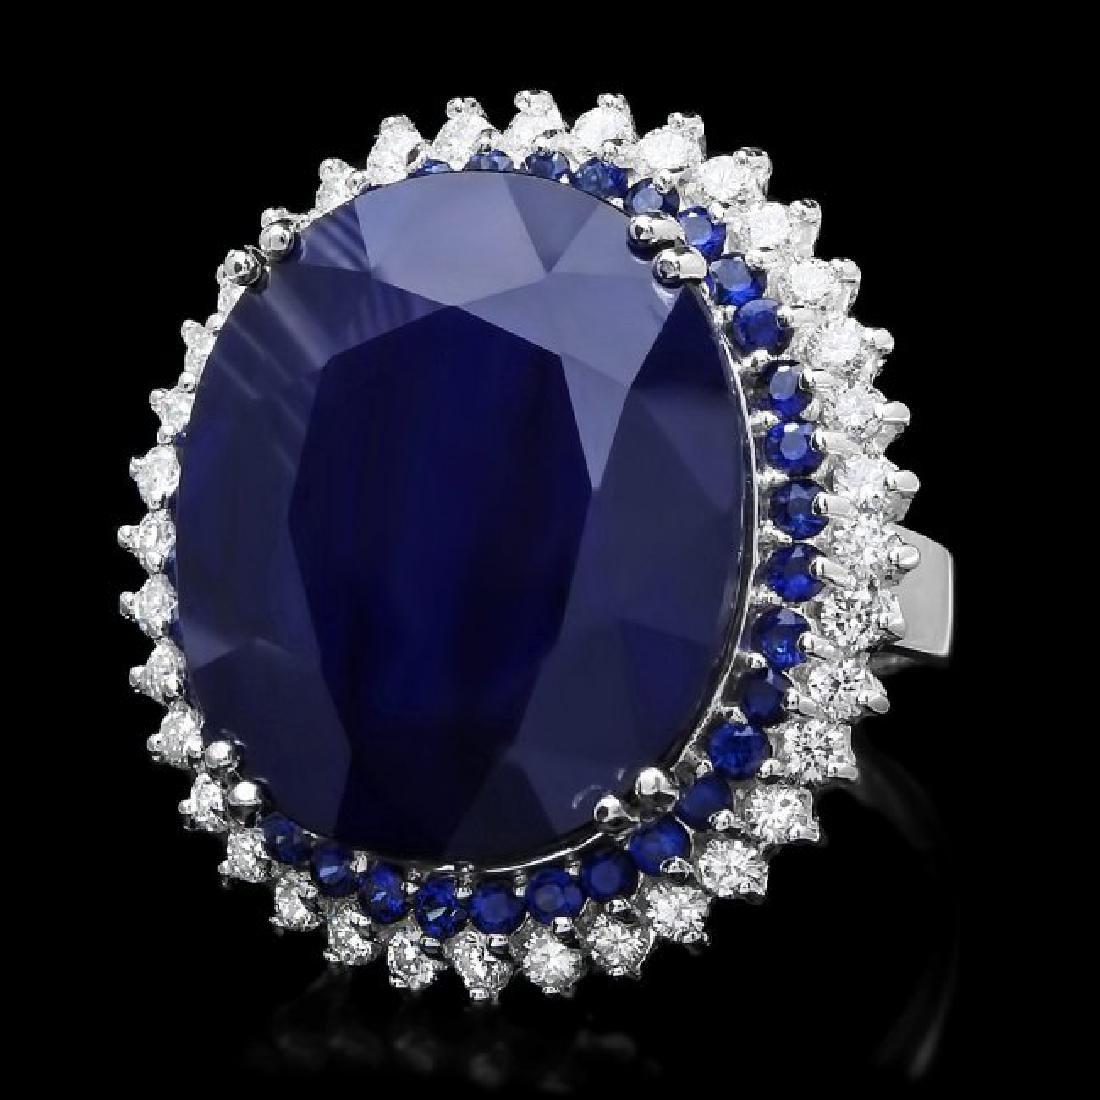 14k Gold 44.4ct Sapphire 1.35ct Diamond Ring